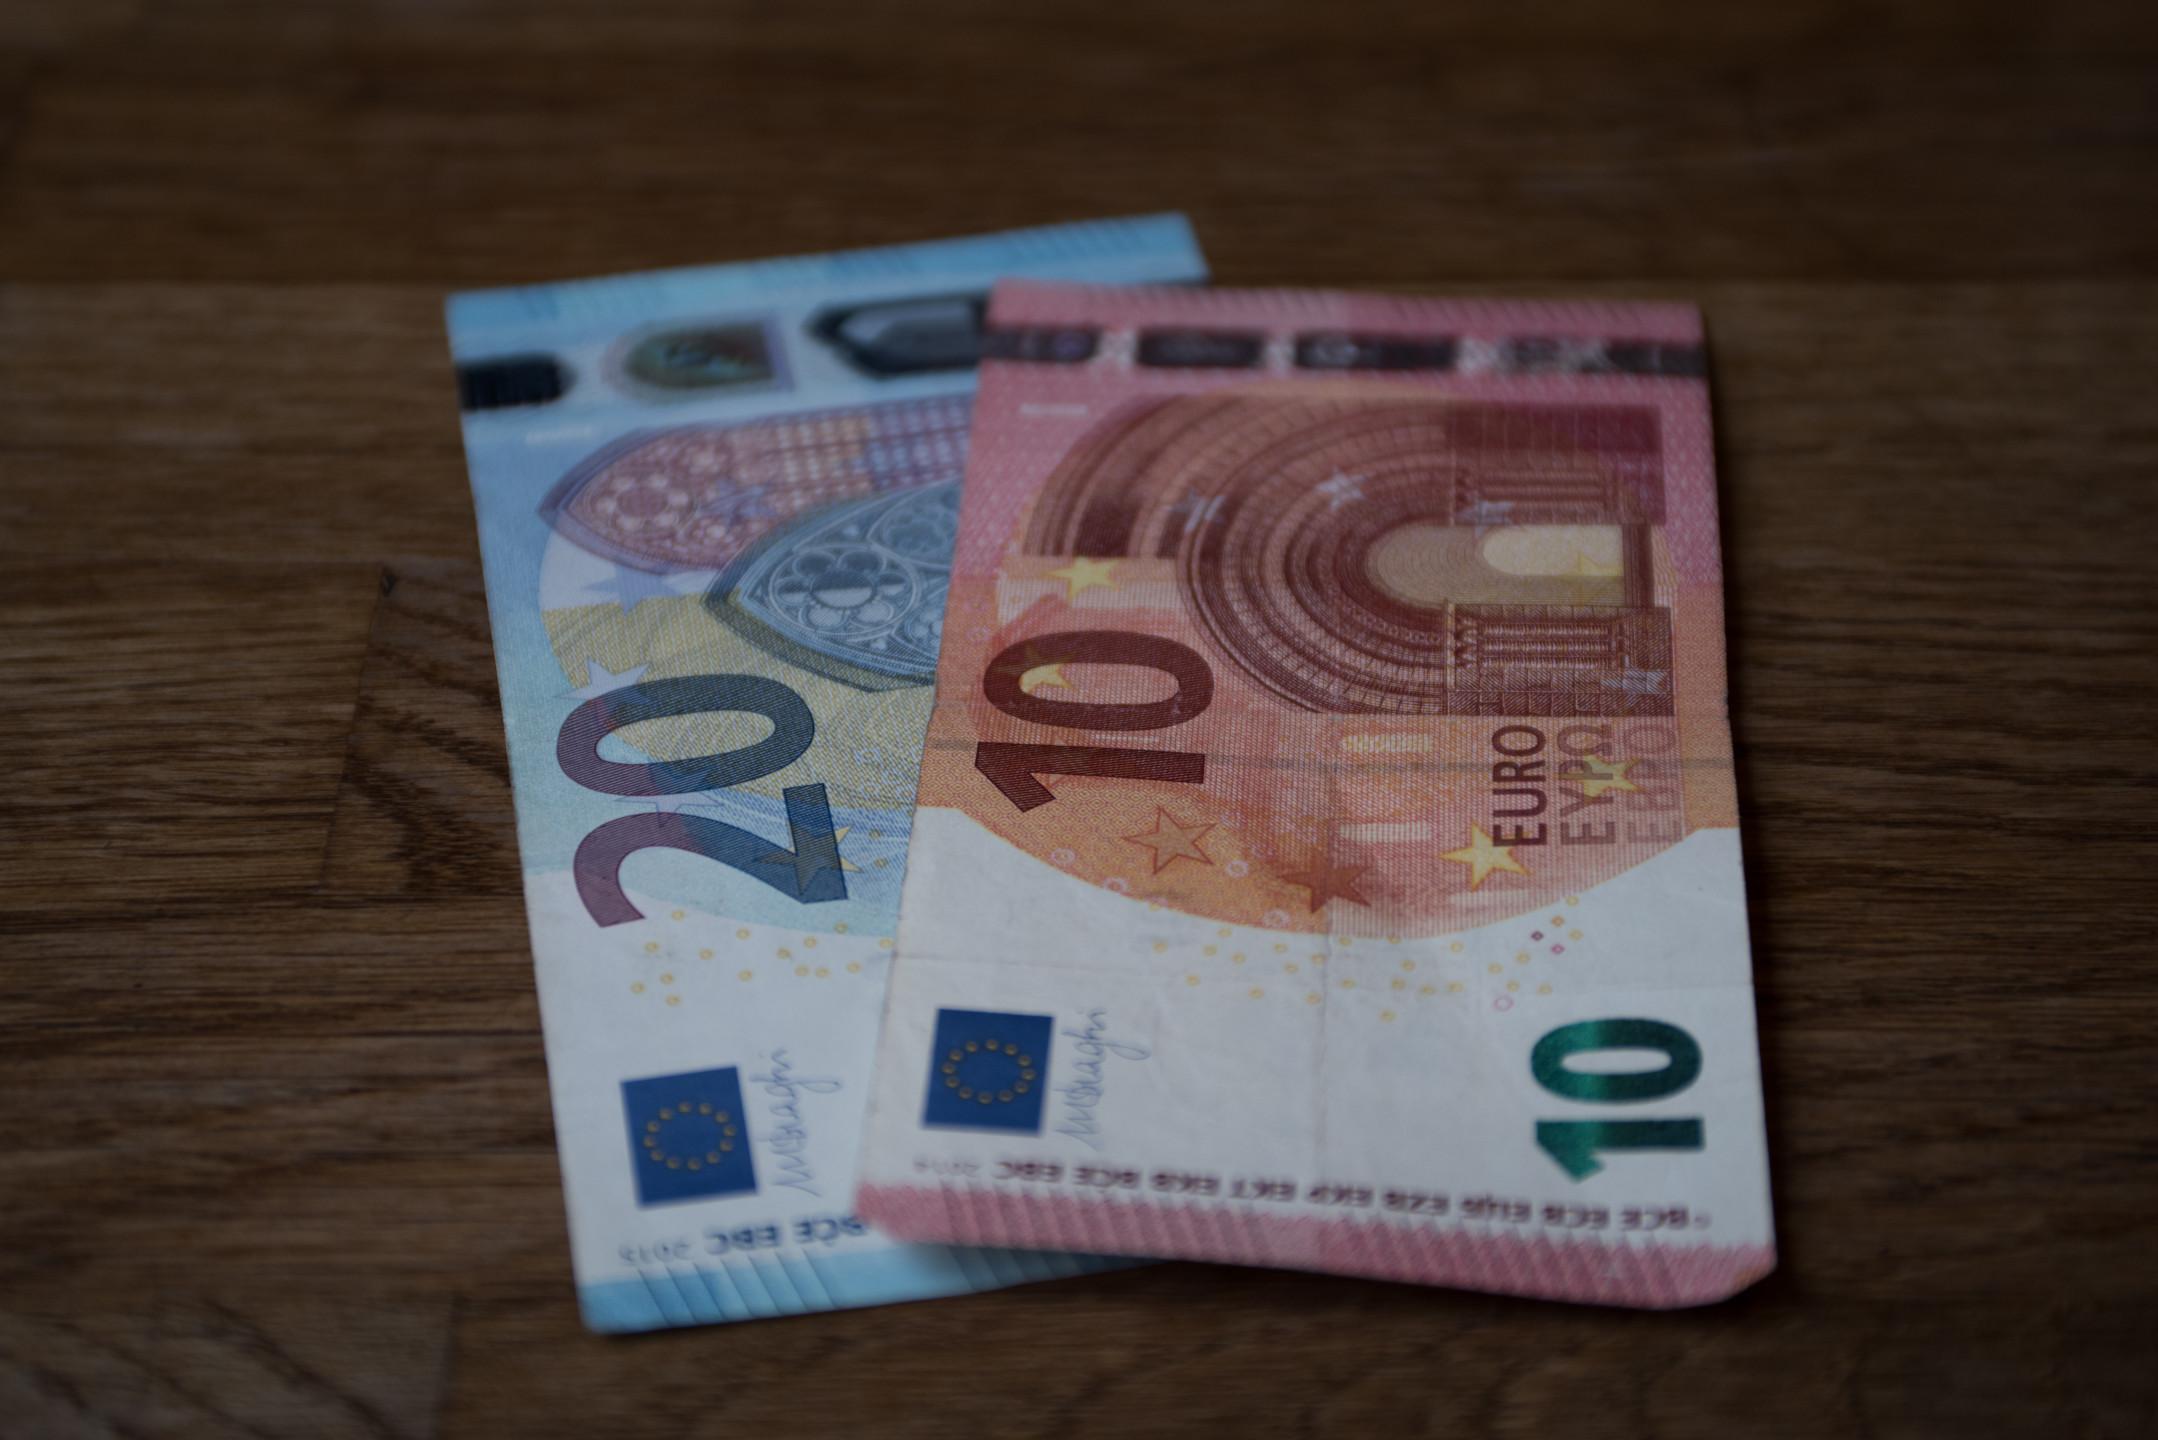 EURUSD analysis - Euro regains bullish momentum